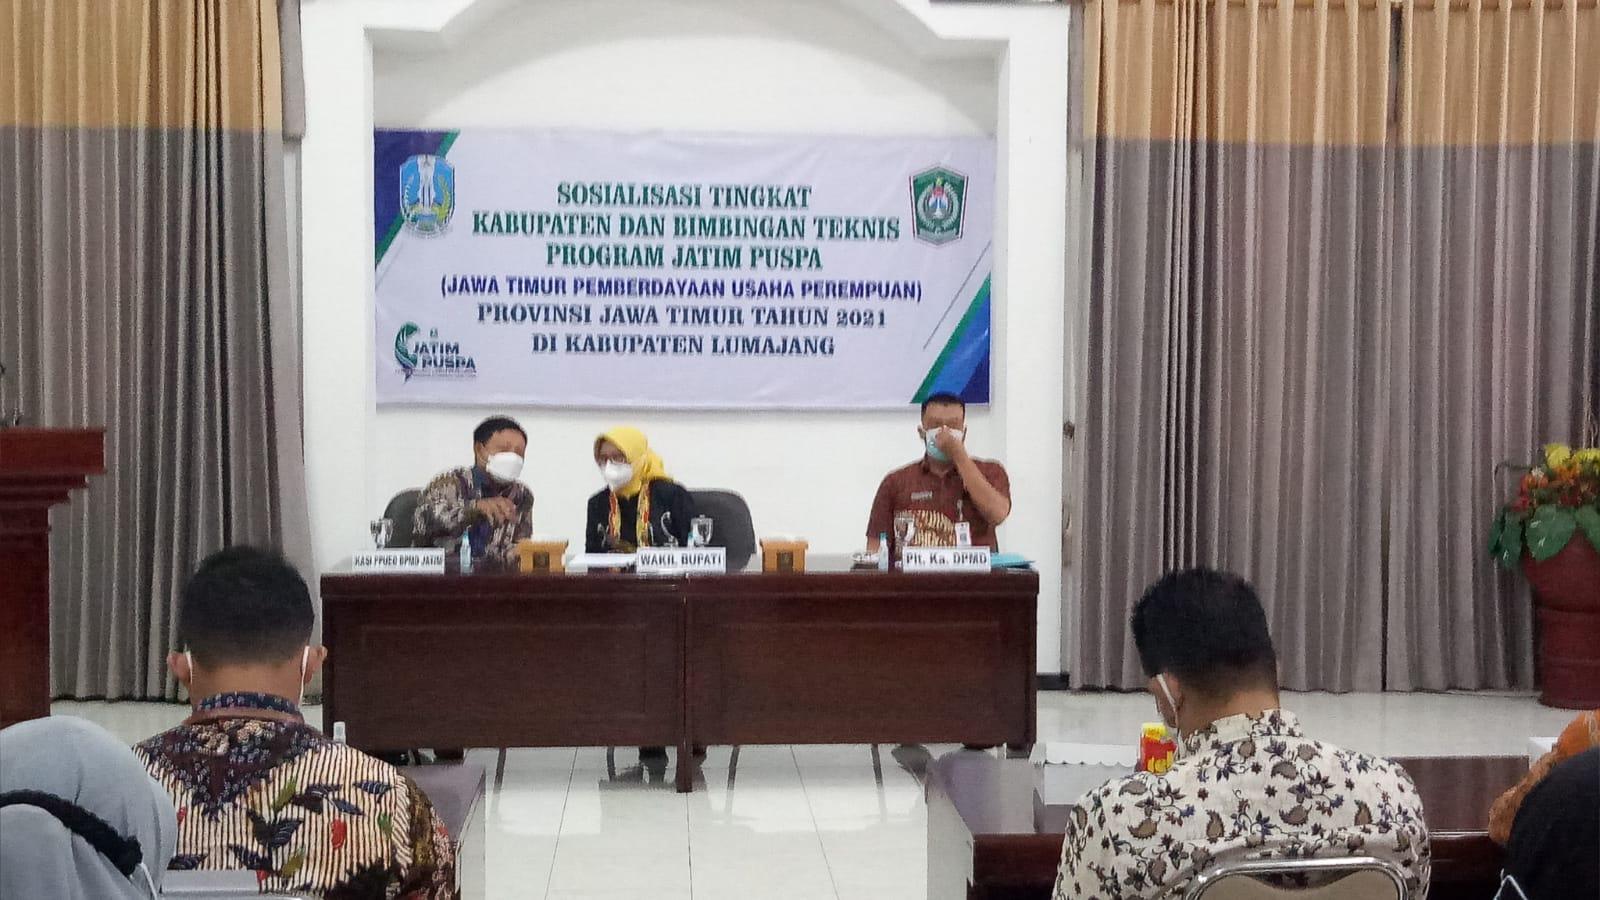 Sosialisasi Tingkat Kabupaten dan Bimbingan Teknis Program Jatim Puspa(Jawa Timur  Pemberdayaan Usaha Perempuan) Provinsi Jawa Timur TA 2021